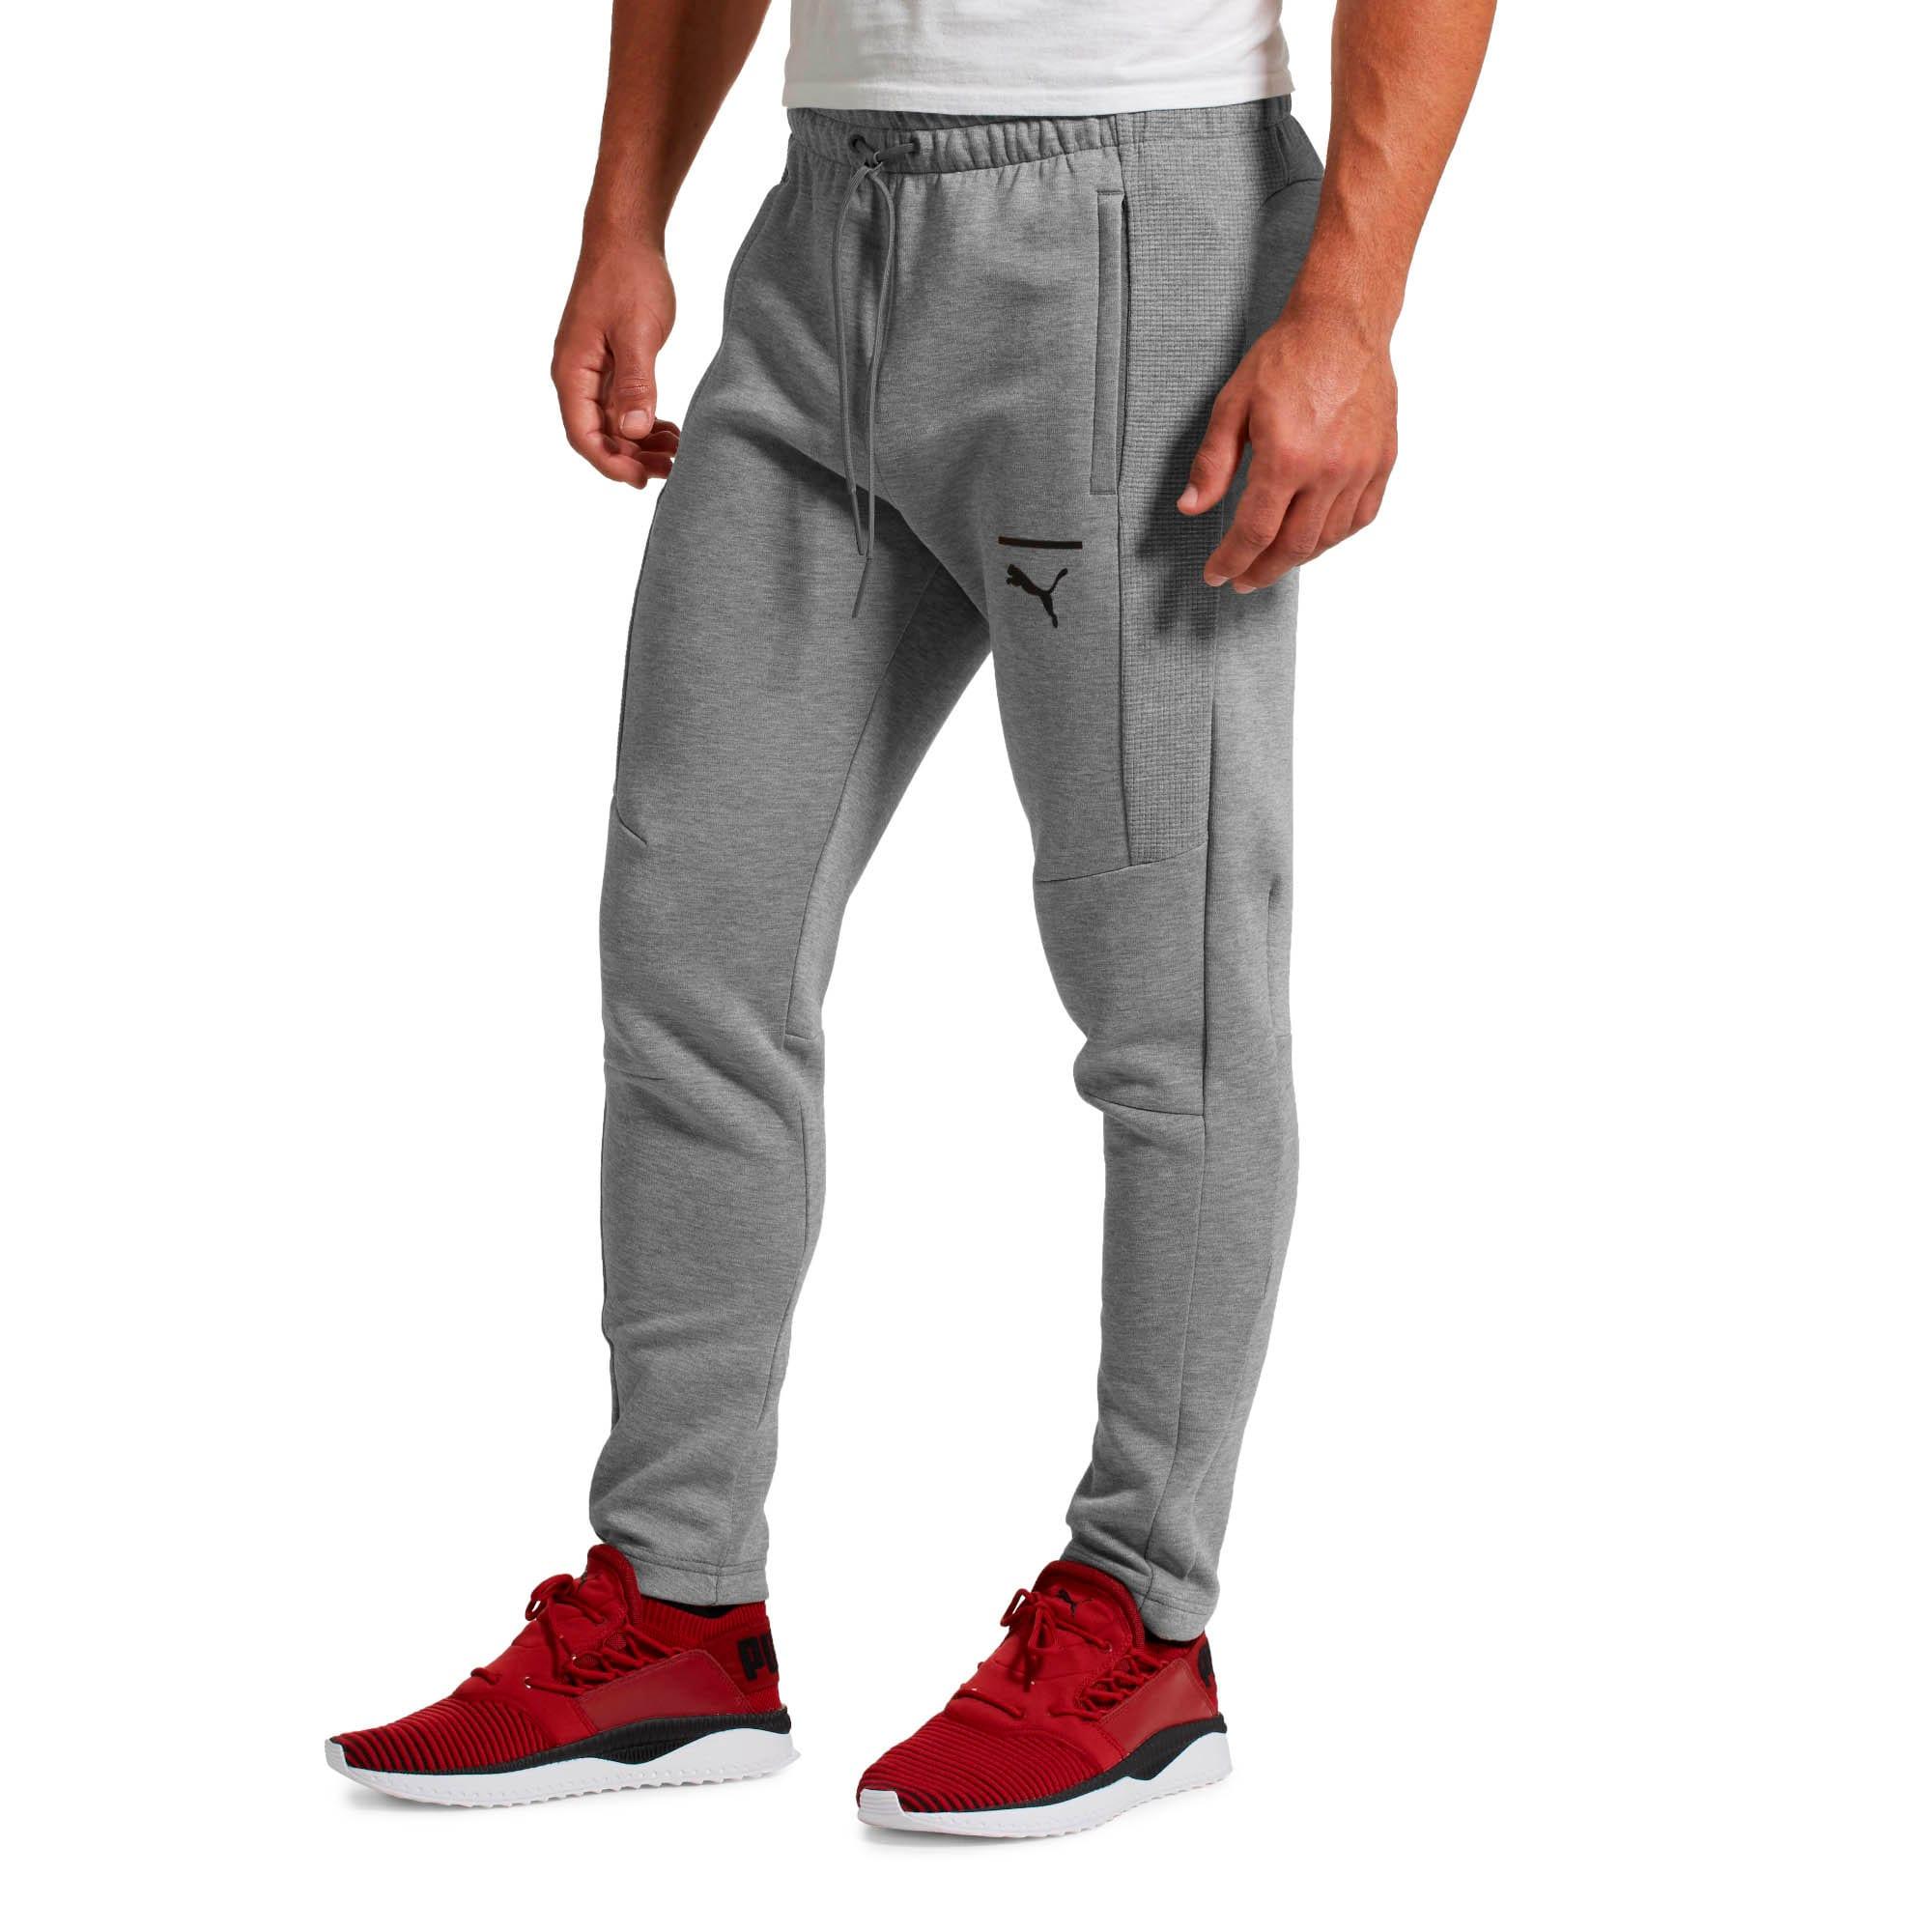 Thumbnail 2 of Pace Men's Sweatpants, Medium Gray Heather, medium